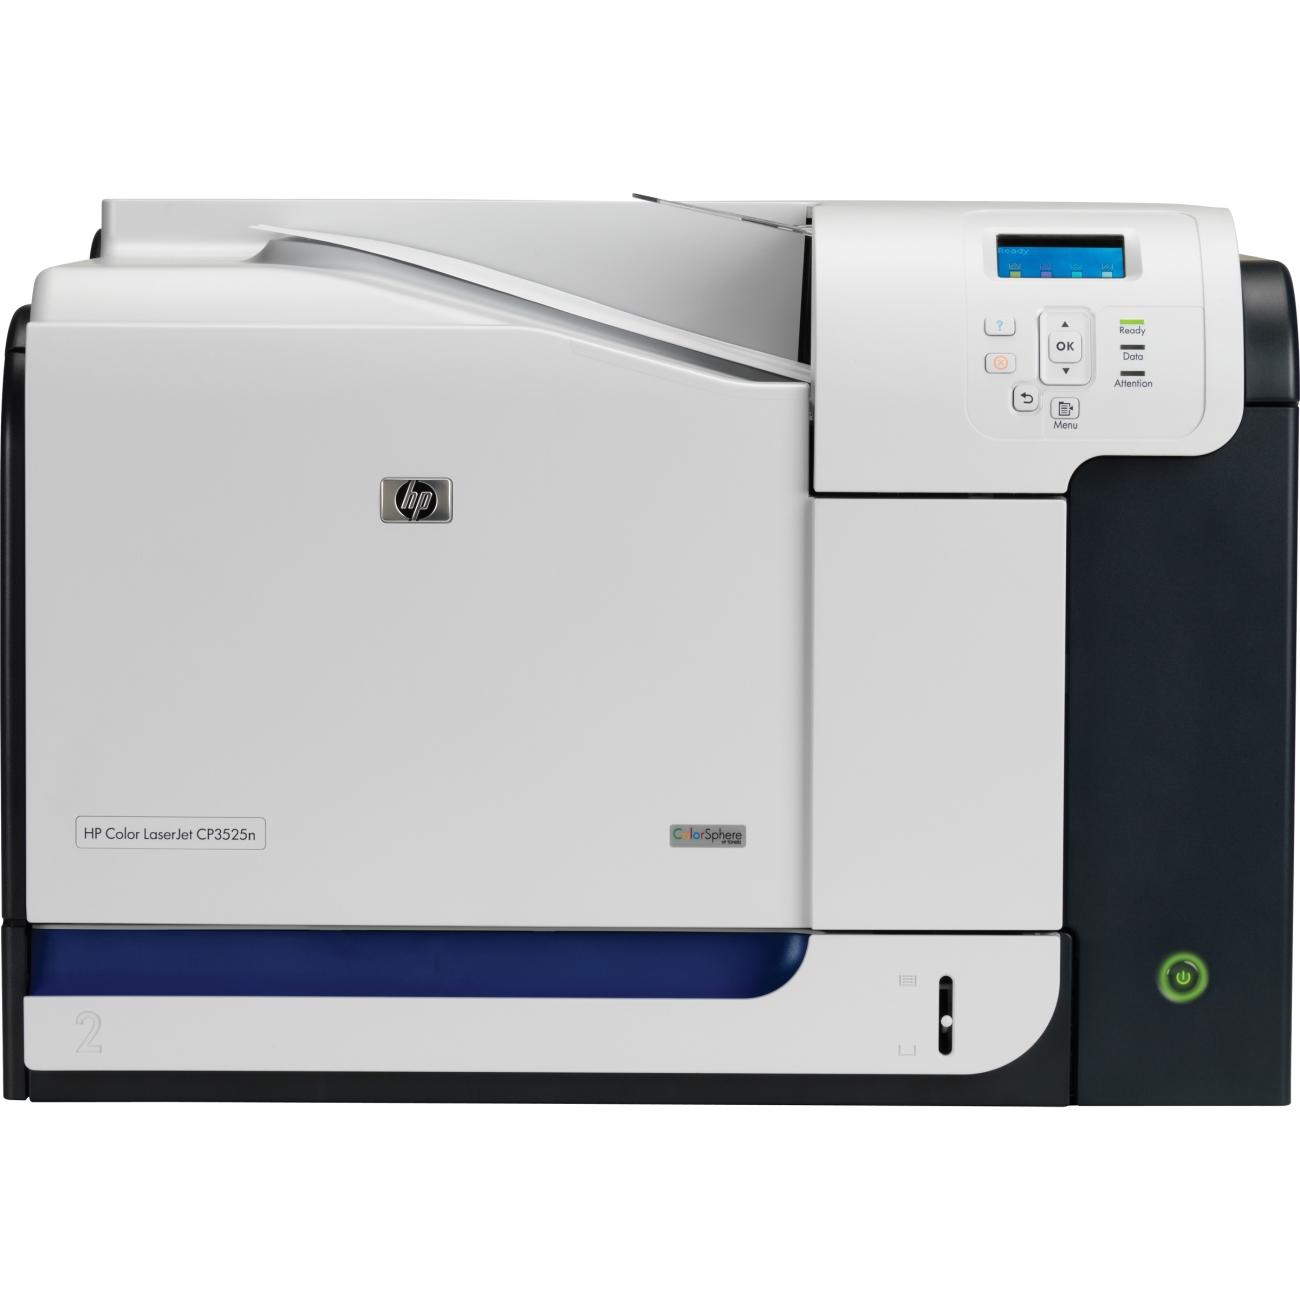 Hp Color Laser Printer That Prints X